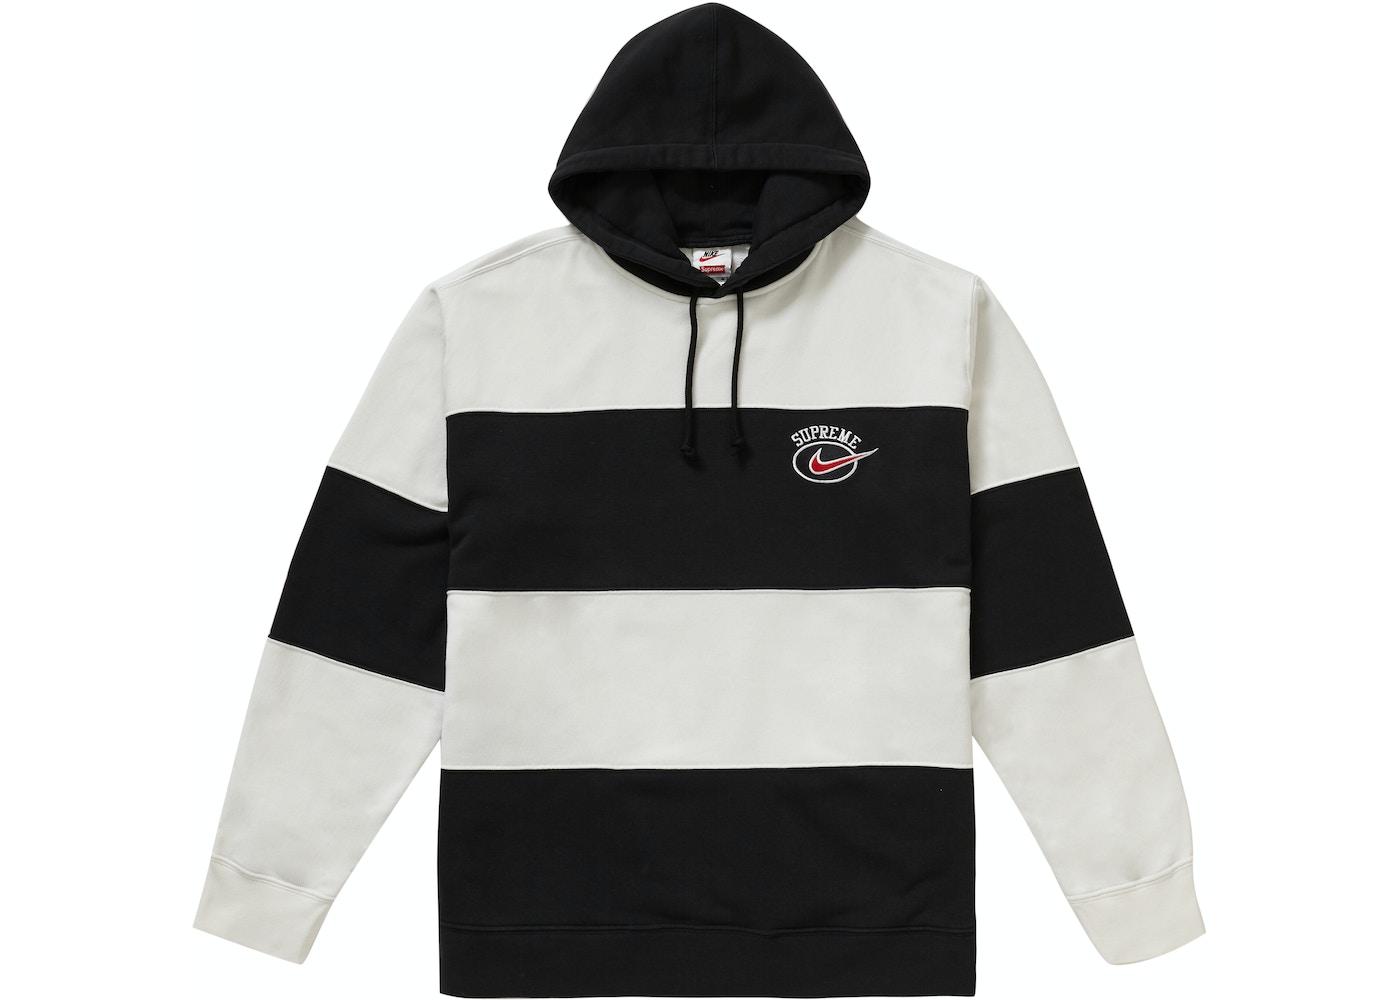 d94fe57a1d6fc Buy   Sell Supreme Streetwear